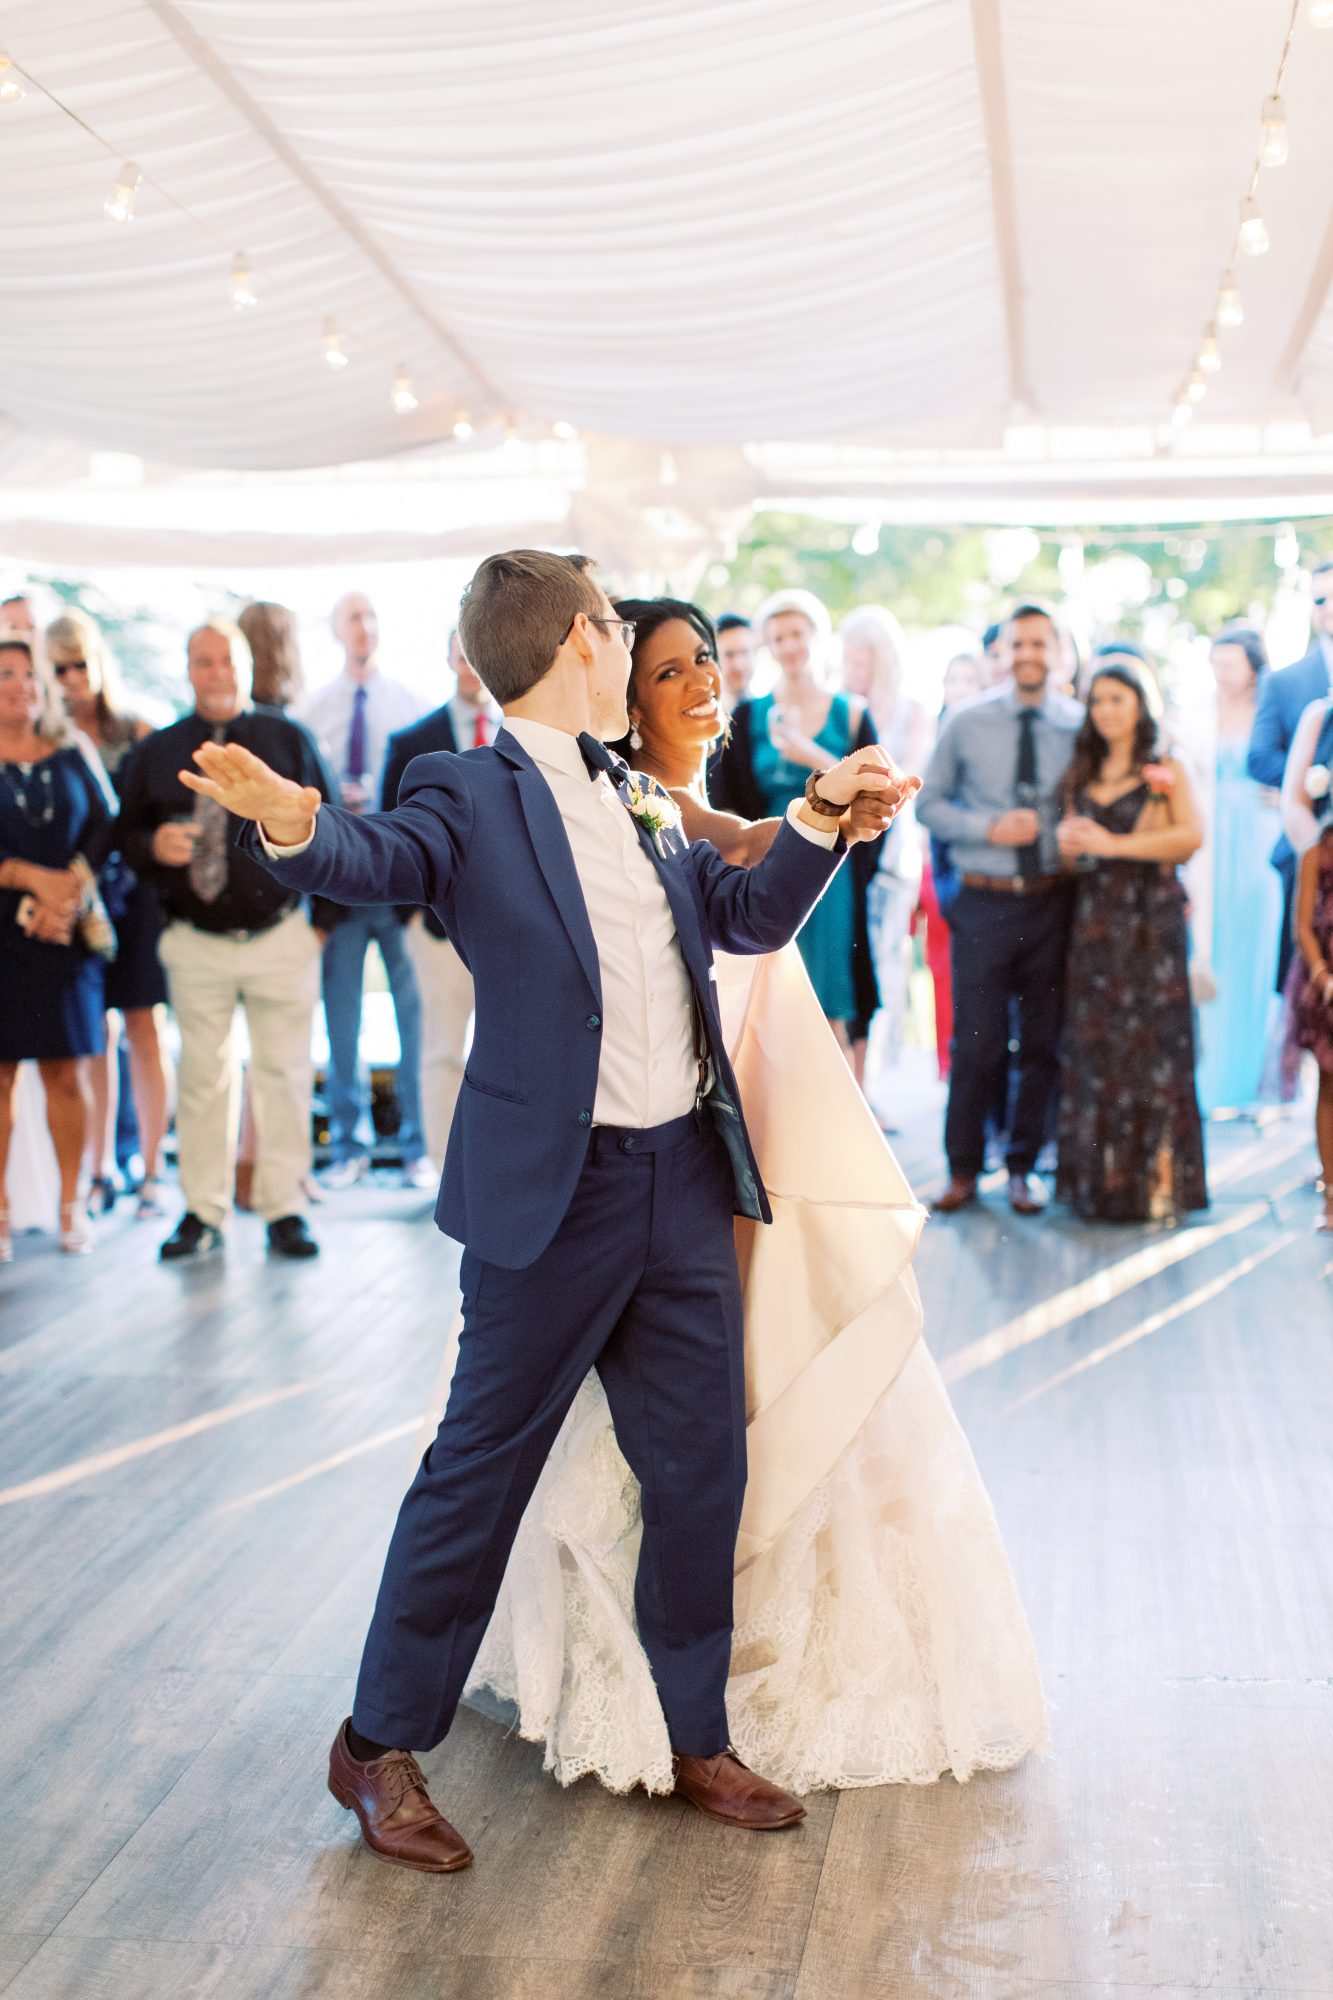 charlene jeremy wedding couple first dance